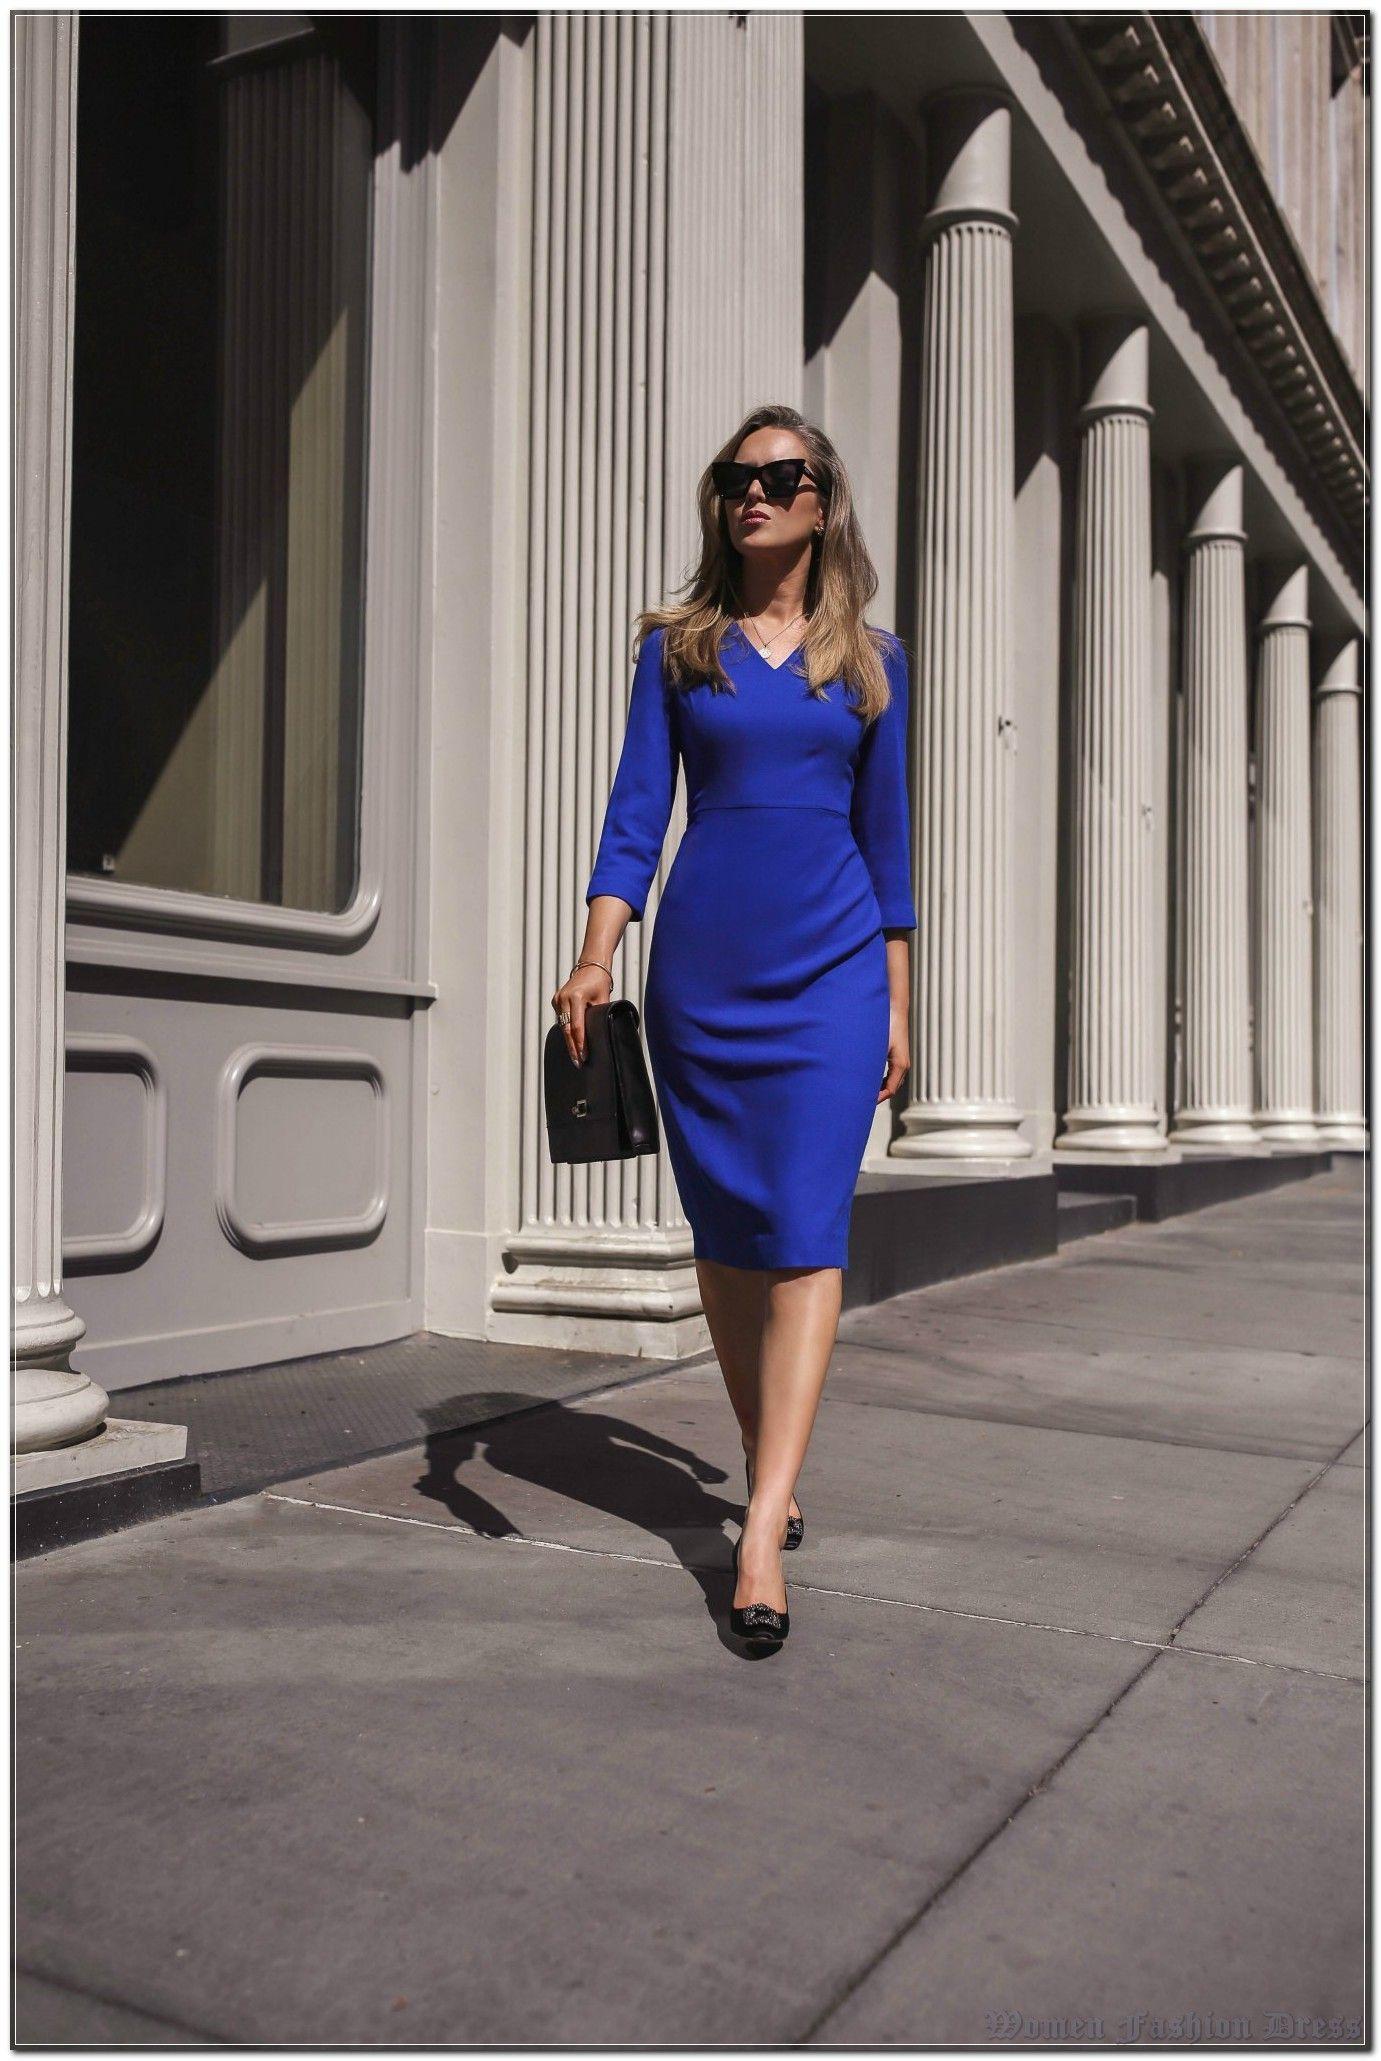 Guaranteed No Stress Women Fashion Dress